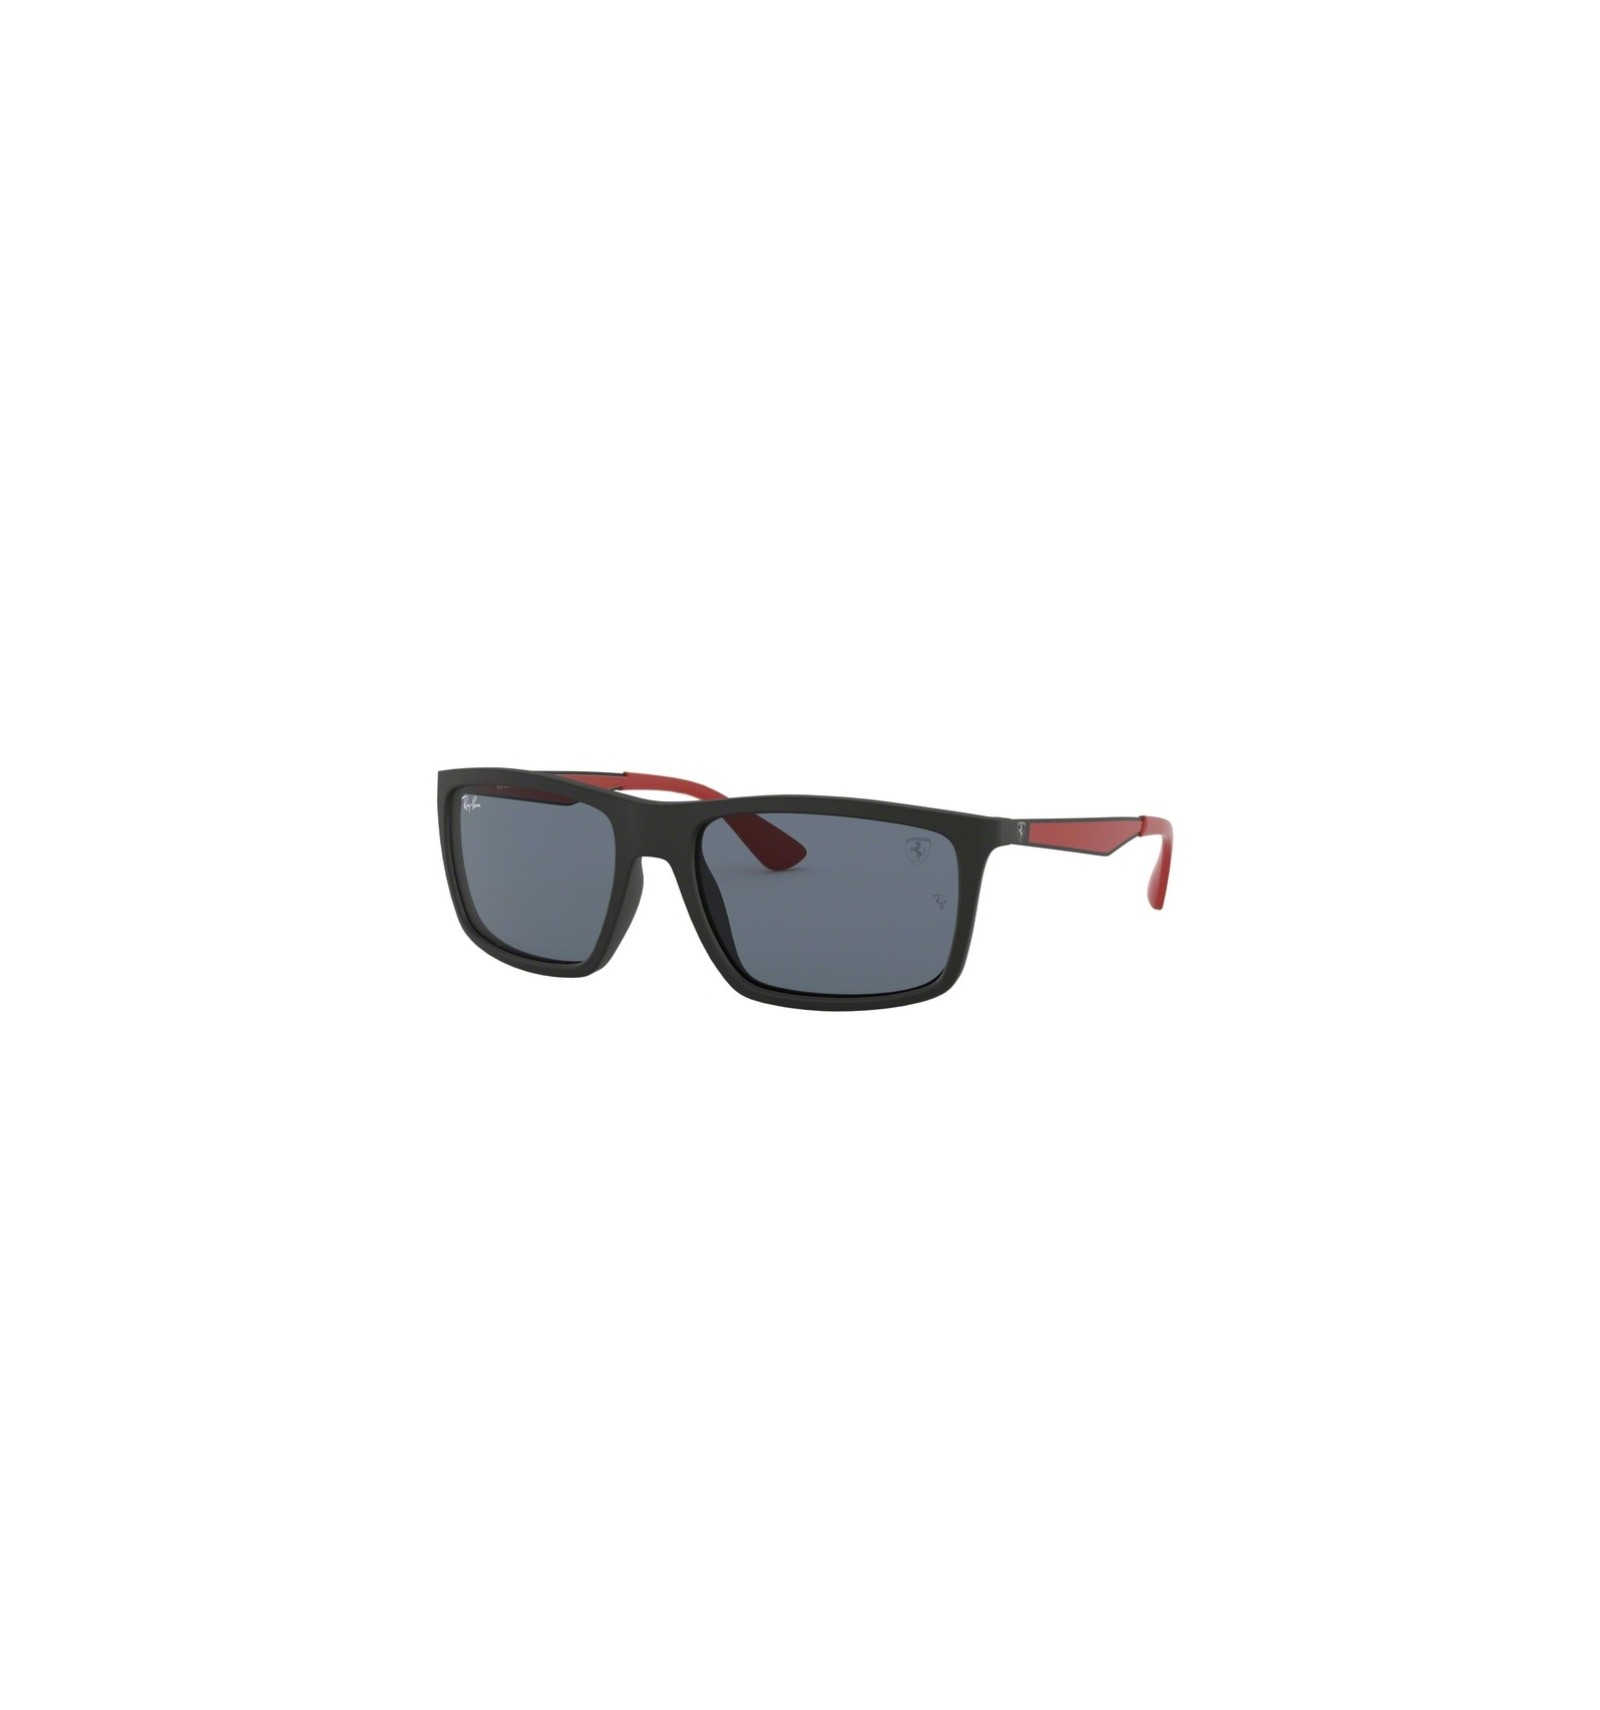 Oscuro Ray De Ban 4228m Mate Gafas Ferrari Sol Negro Gris gbY7f6y